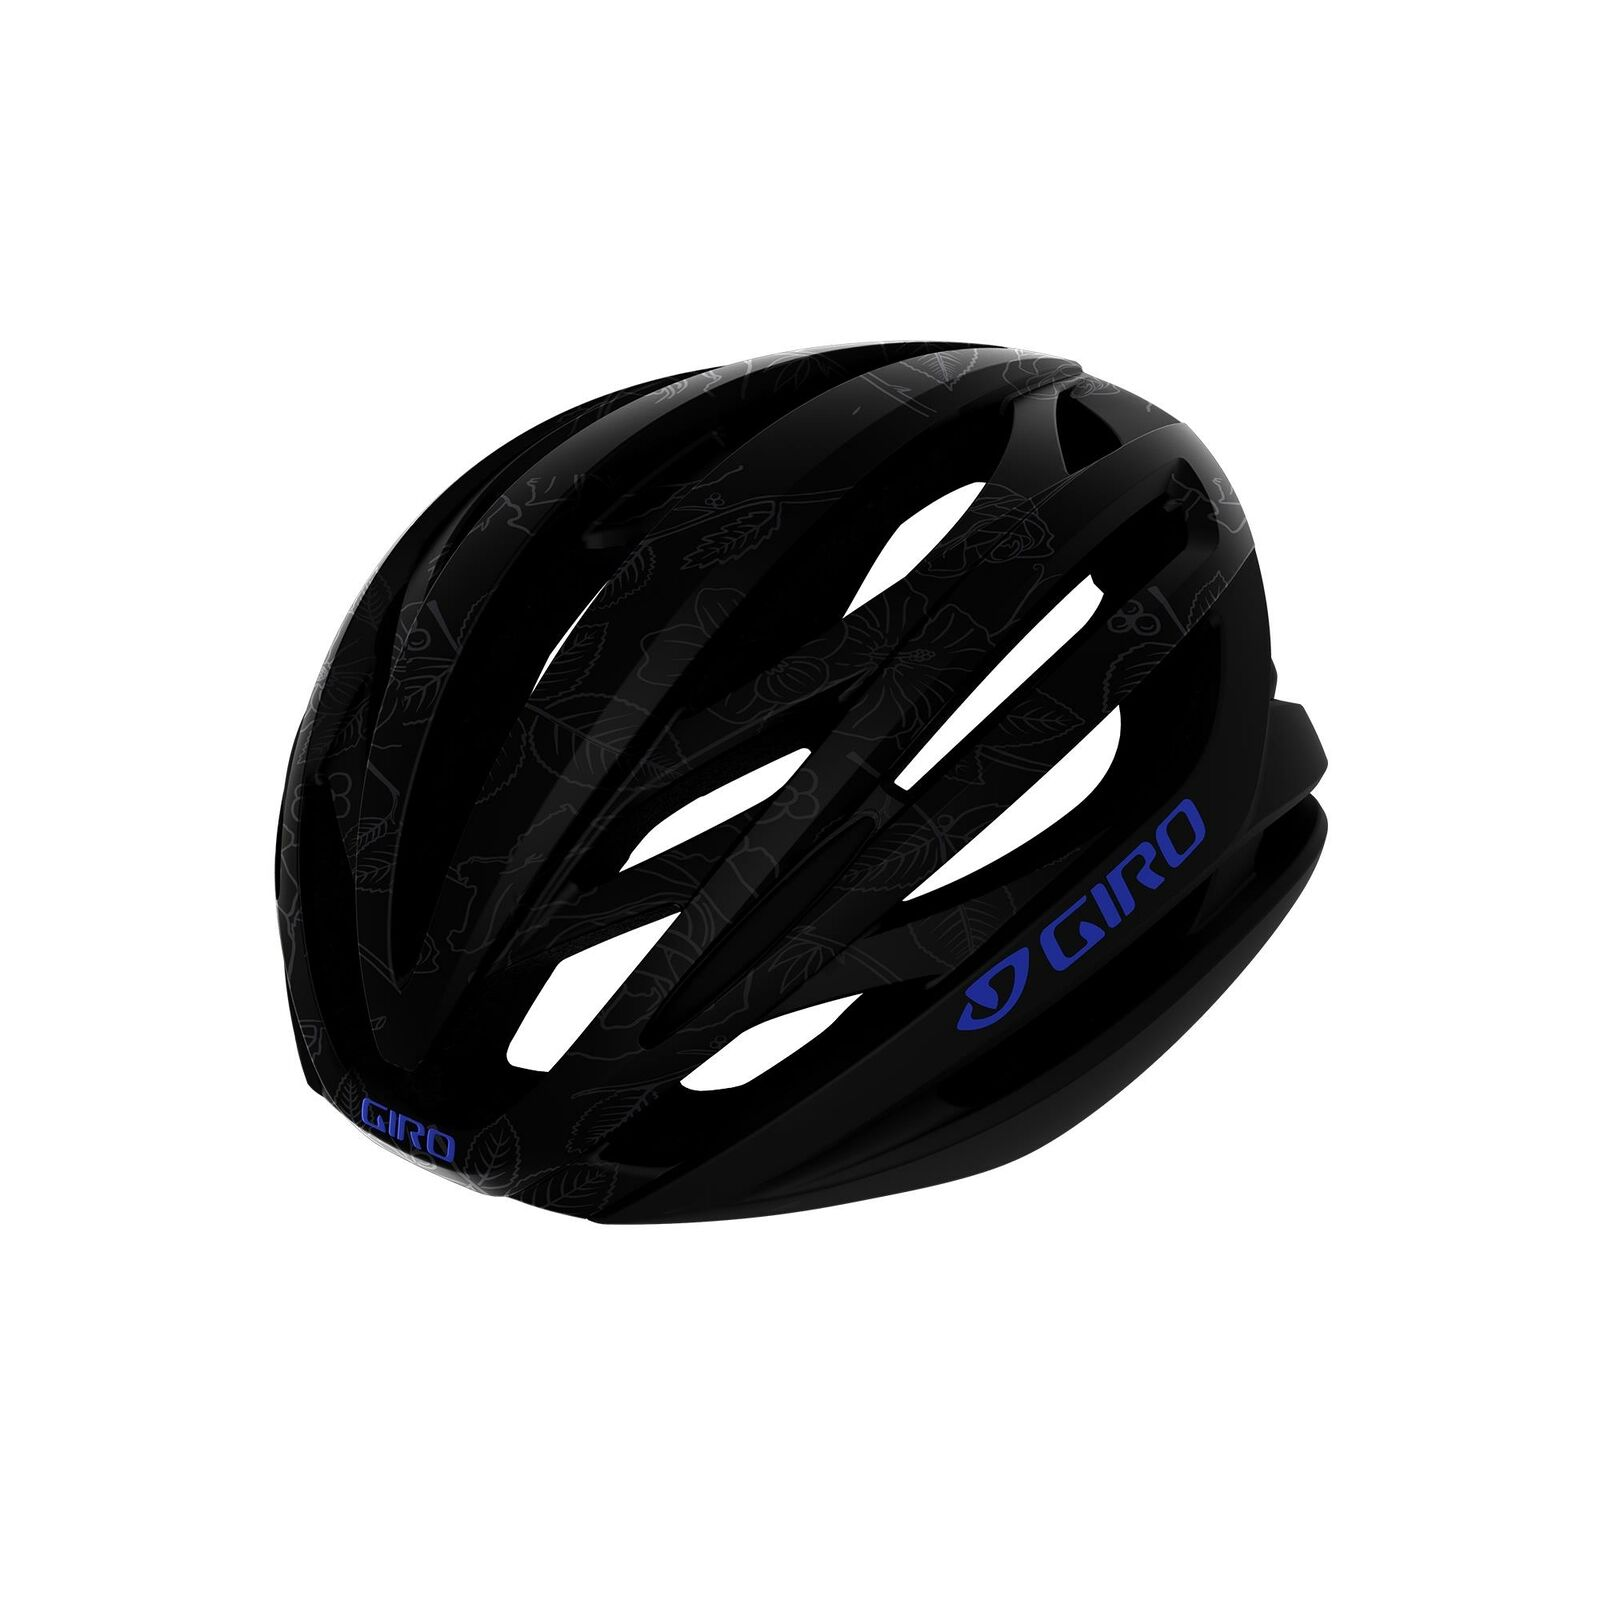 Dawes Giro 300 Ladies Bike for sale | eBay